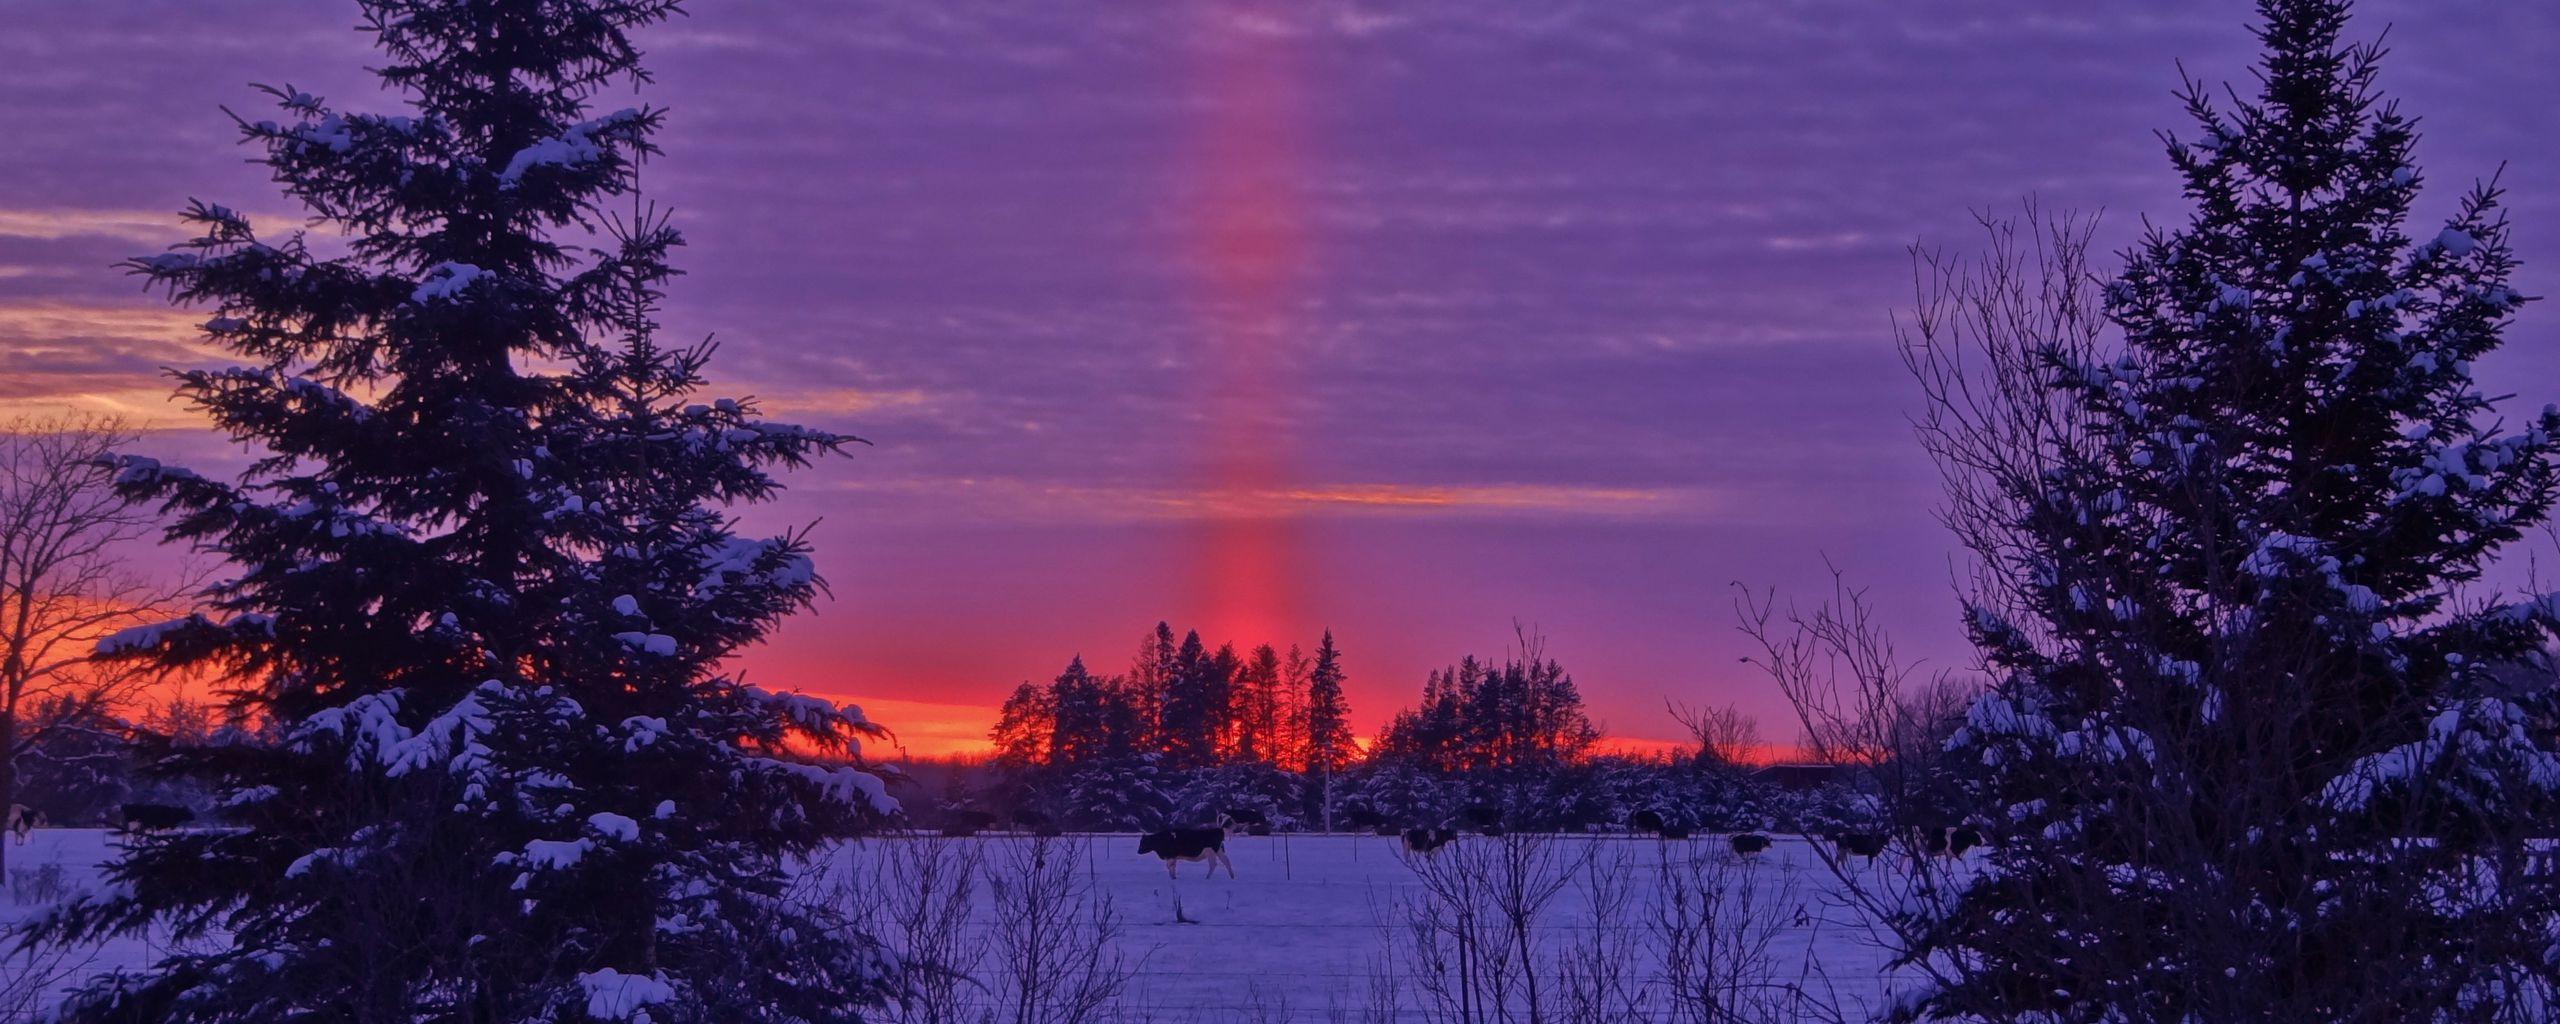 2560x1024 Wallpaper winter, sunset, field, landscape